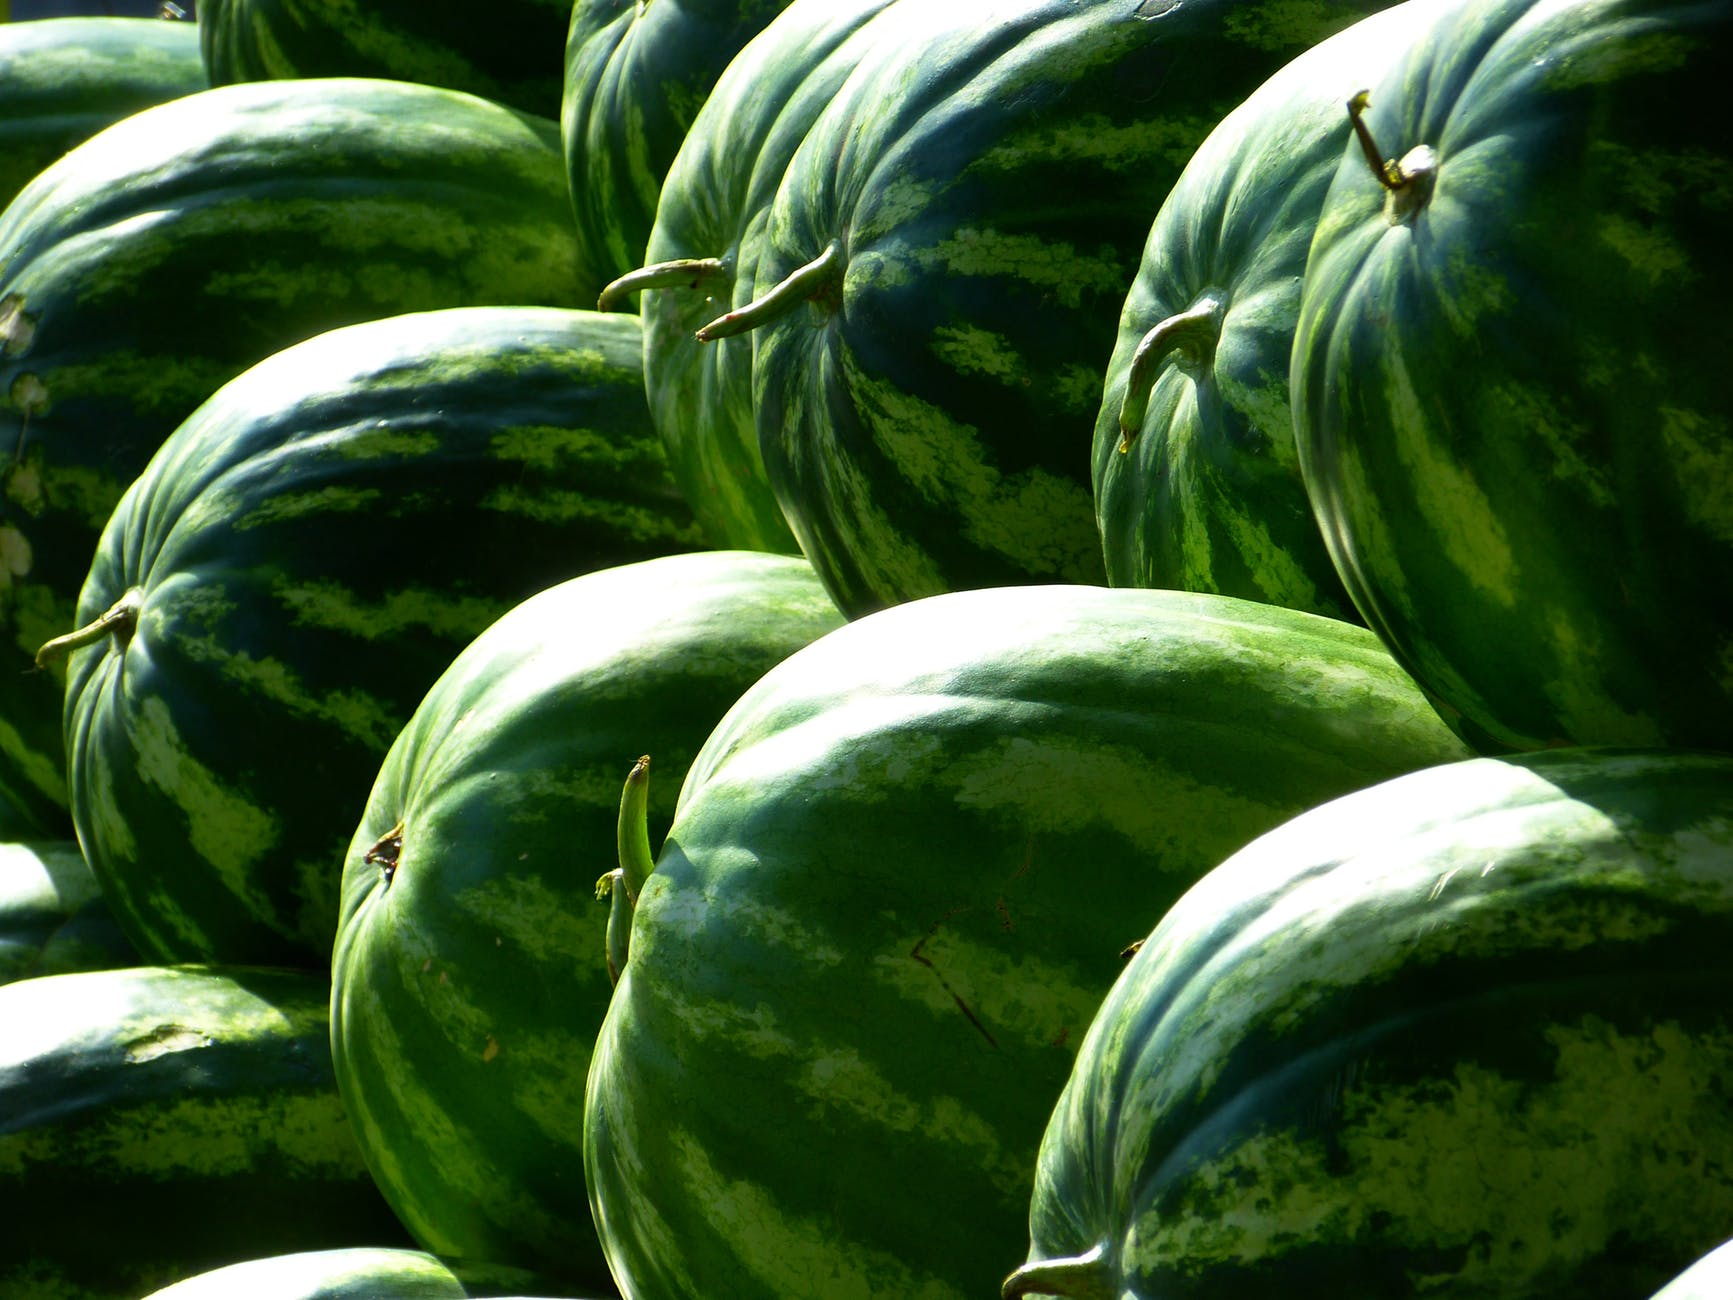 green piled watermelon